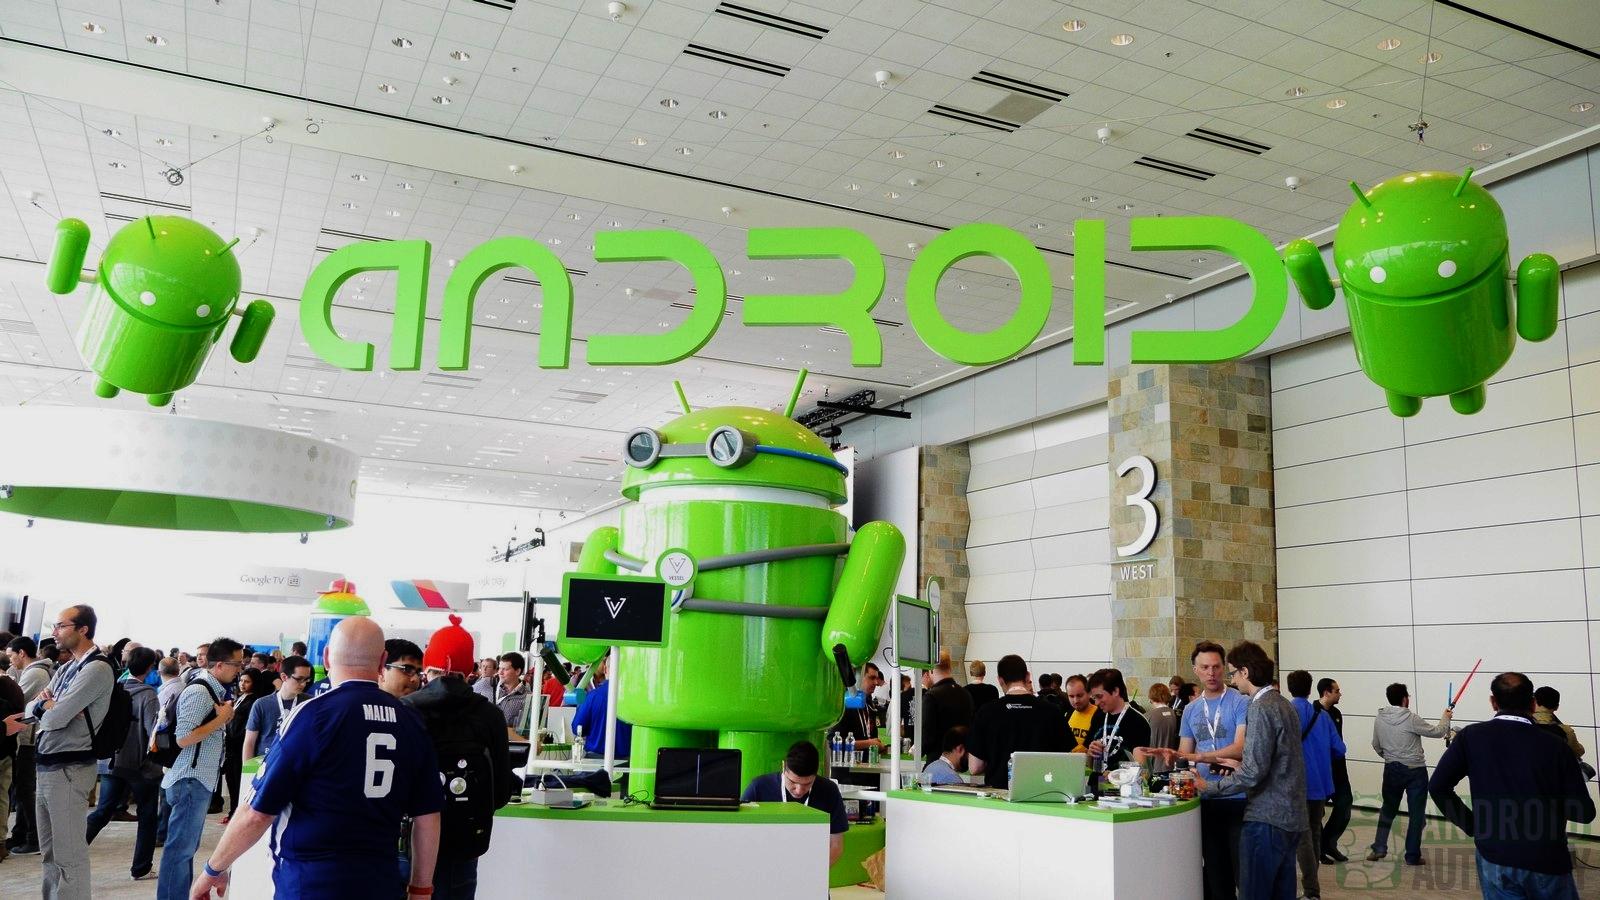 Android-logo-green-robot-7-1600-aa